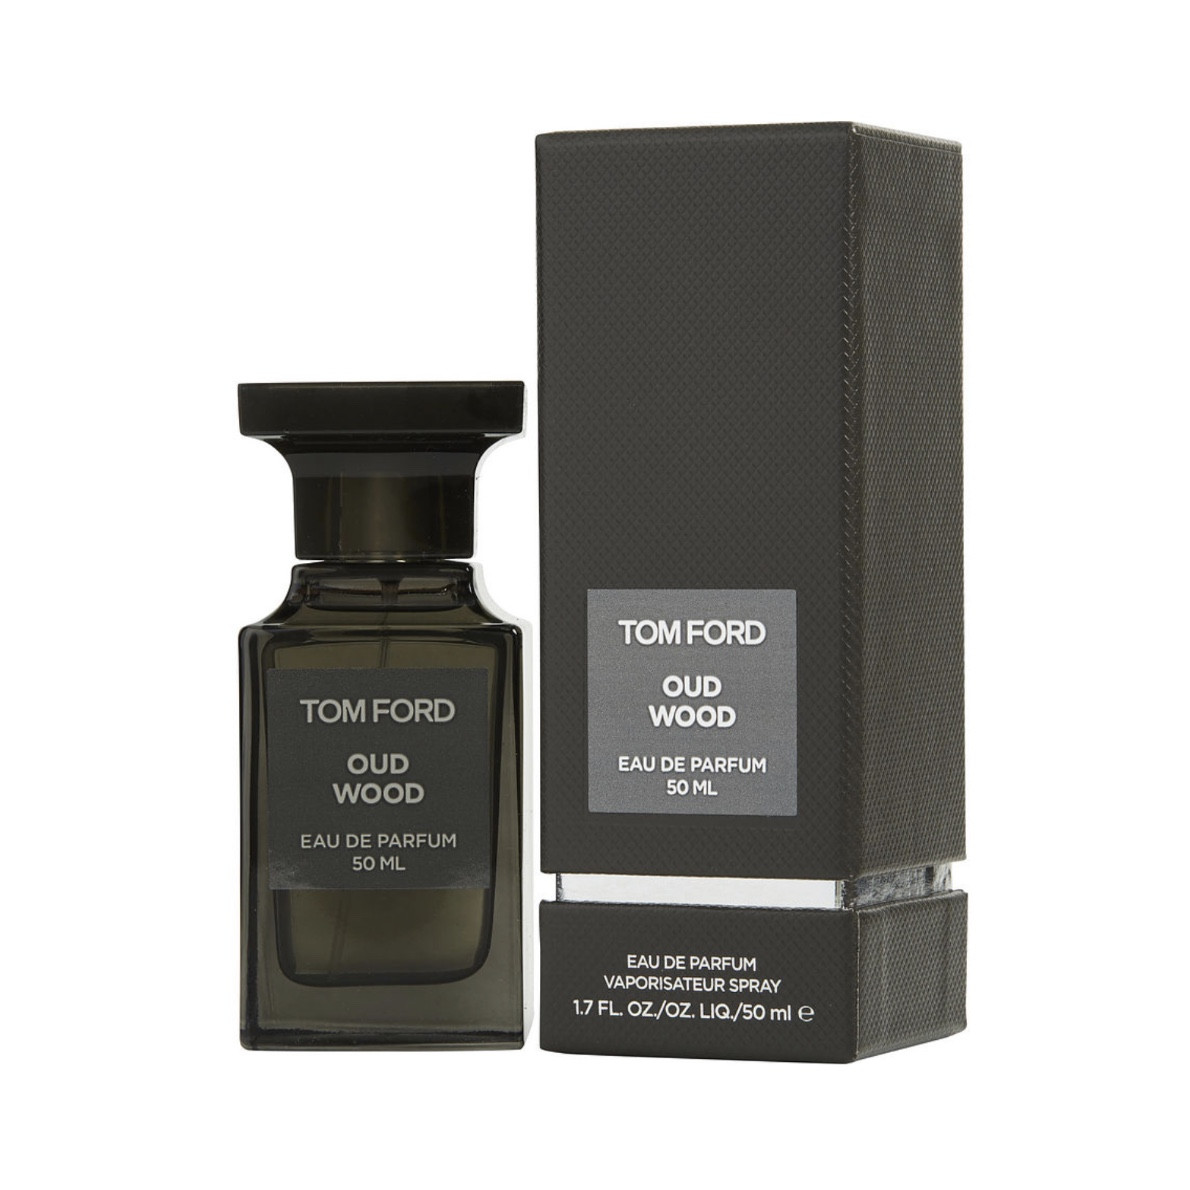 TOM FORD Oud Wood (Том Форд Уд Вуд) парфюмированная вода - 50ml